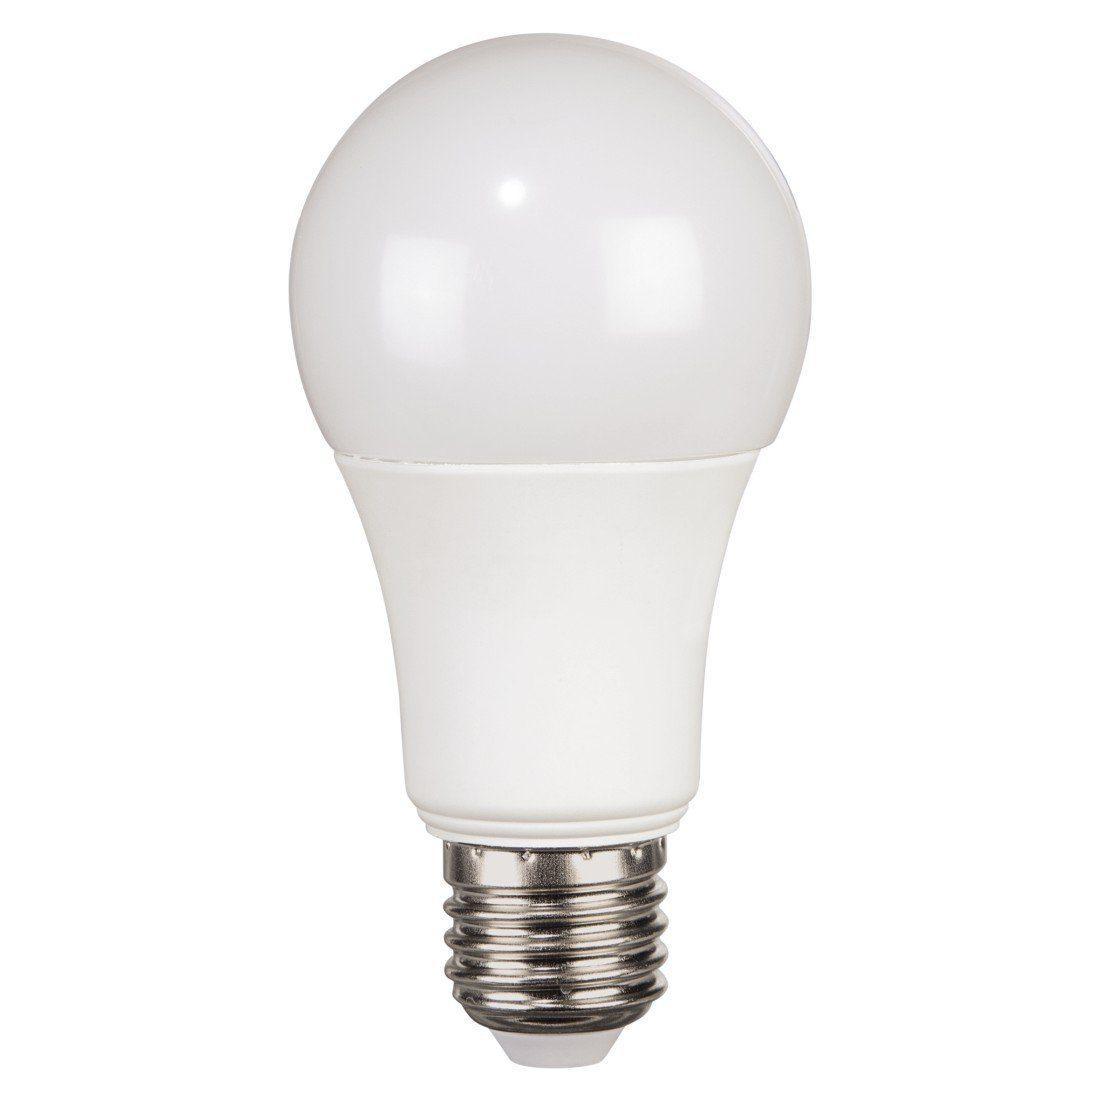 Xavax LED-Lampe, E27, 1060lm ersetzt 75W Glühlampe, Warmweiß, dimmbar